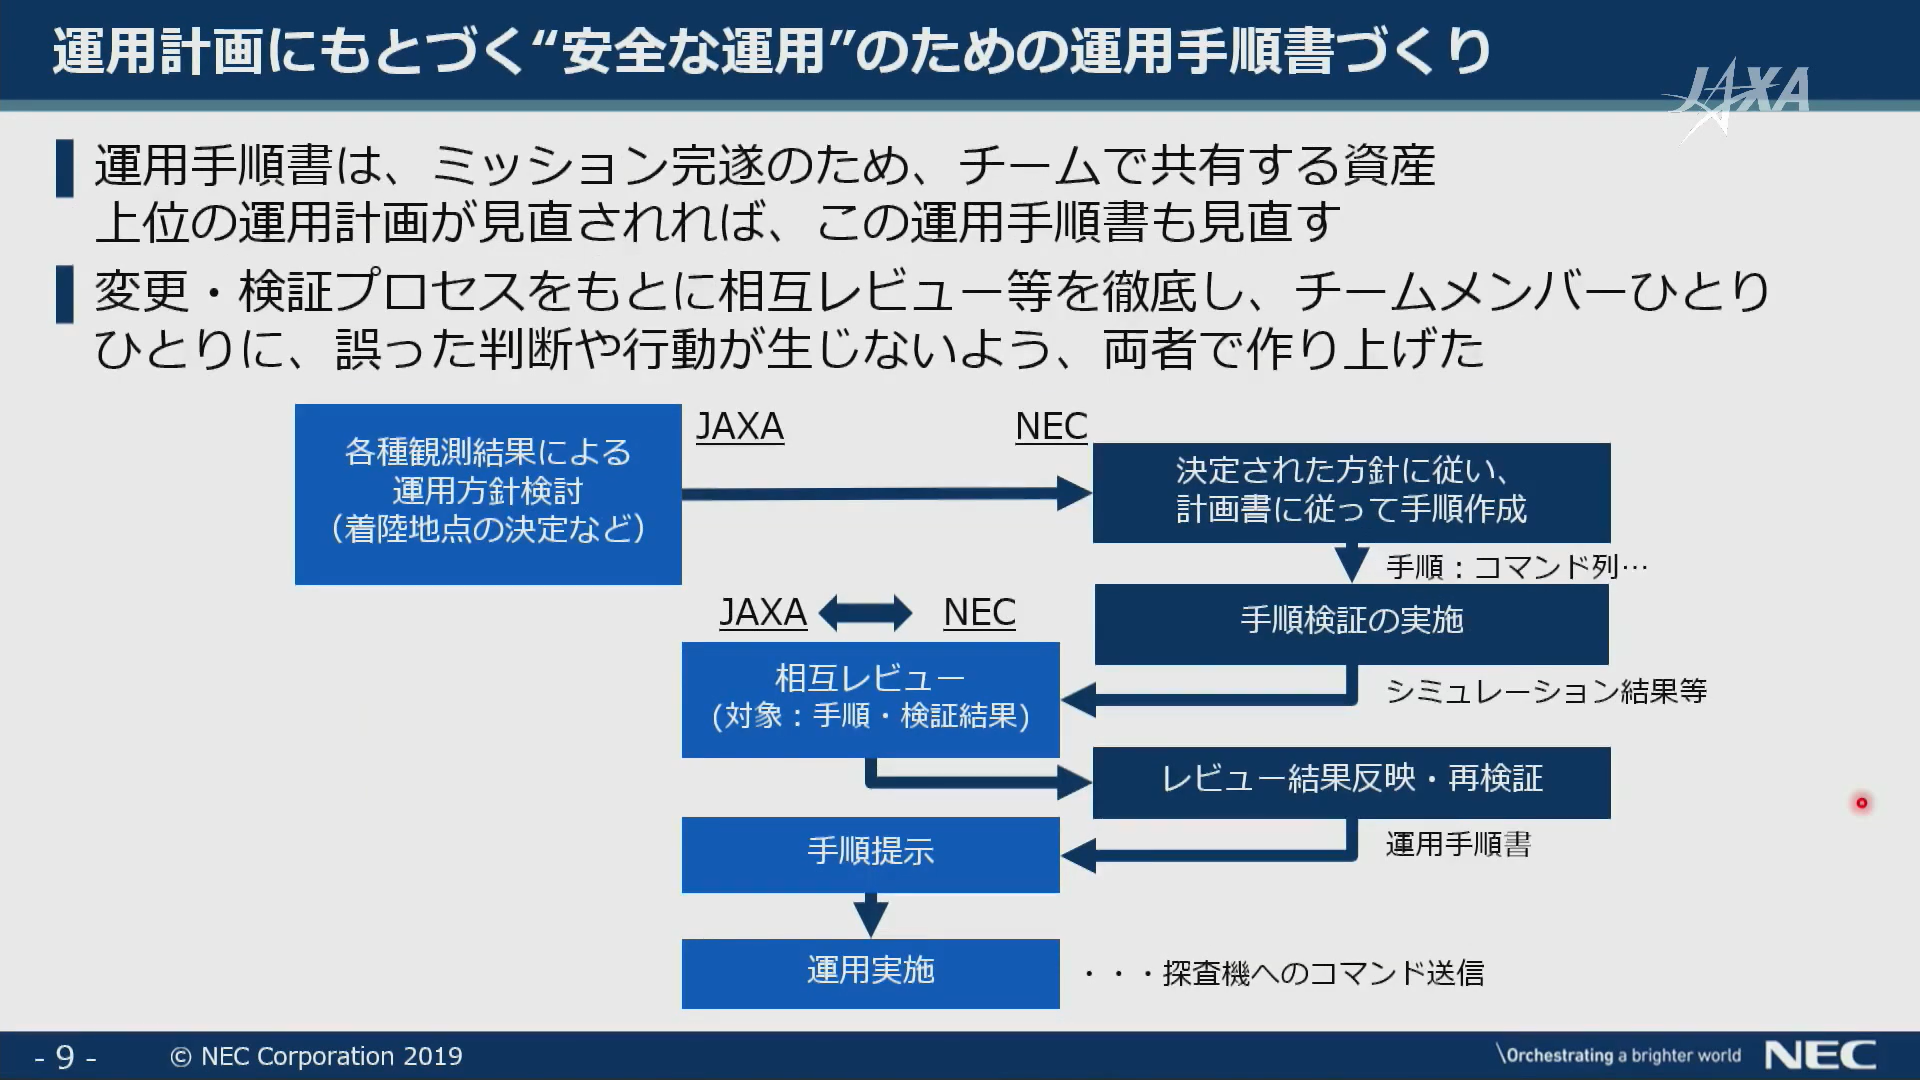 f:id:Imamura:20191219211838p:plain